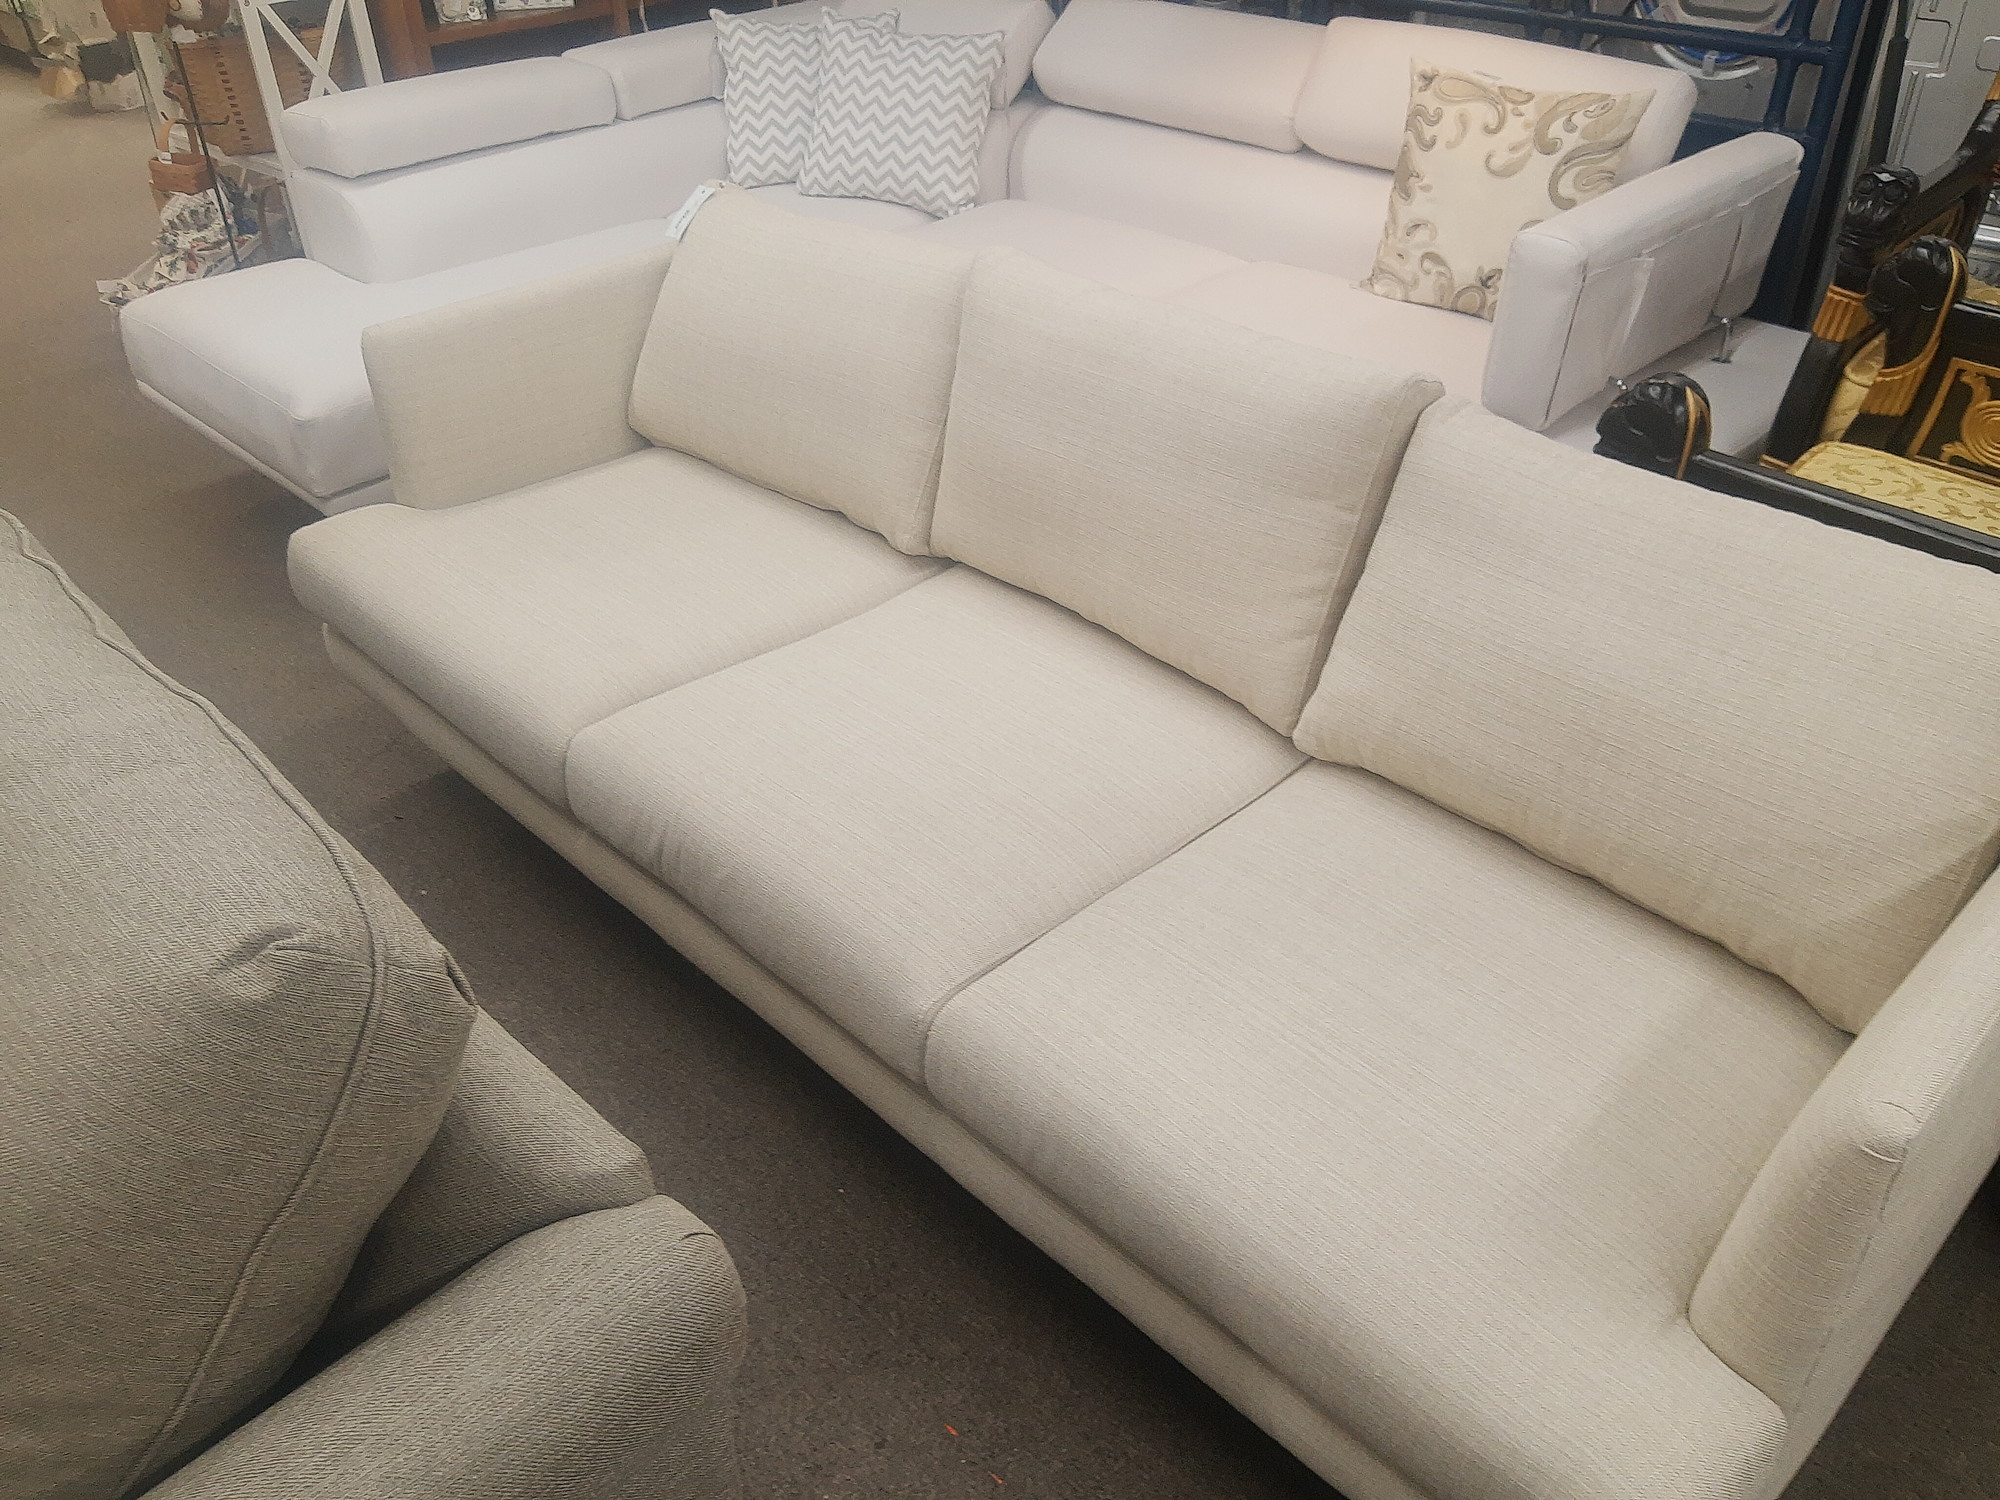 Sofa Company Tweed 84 inch Sofa 1100 retail price!